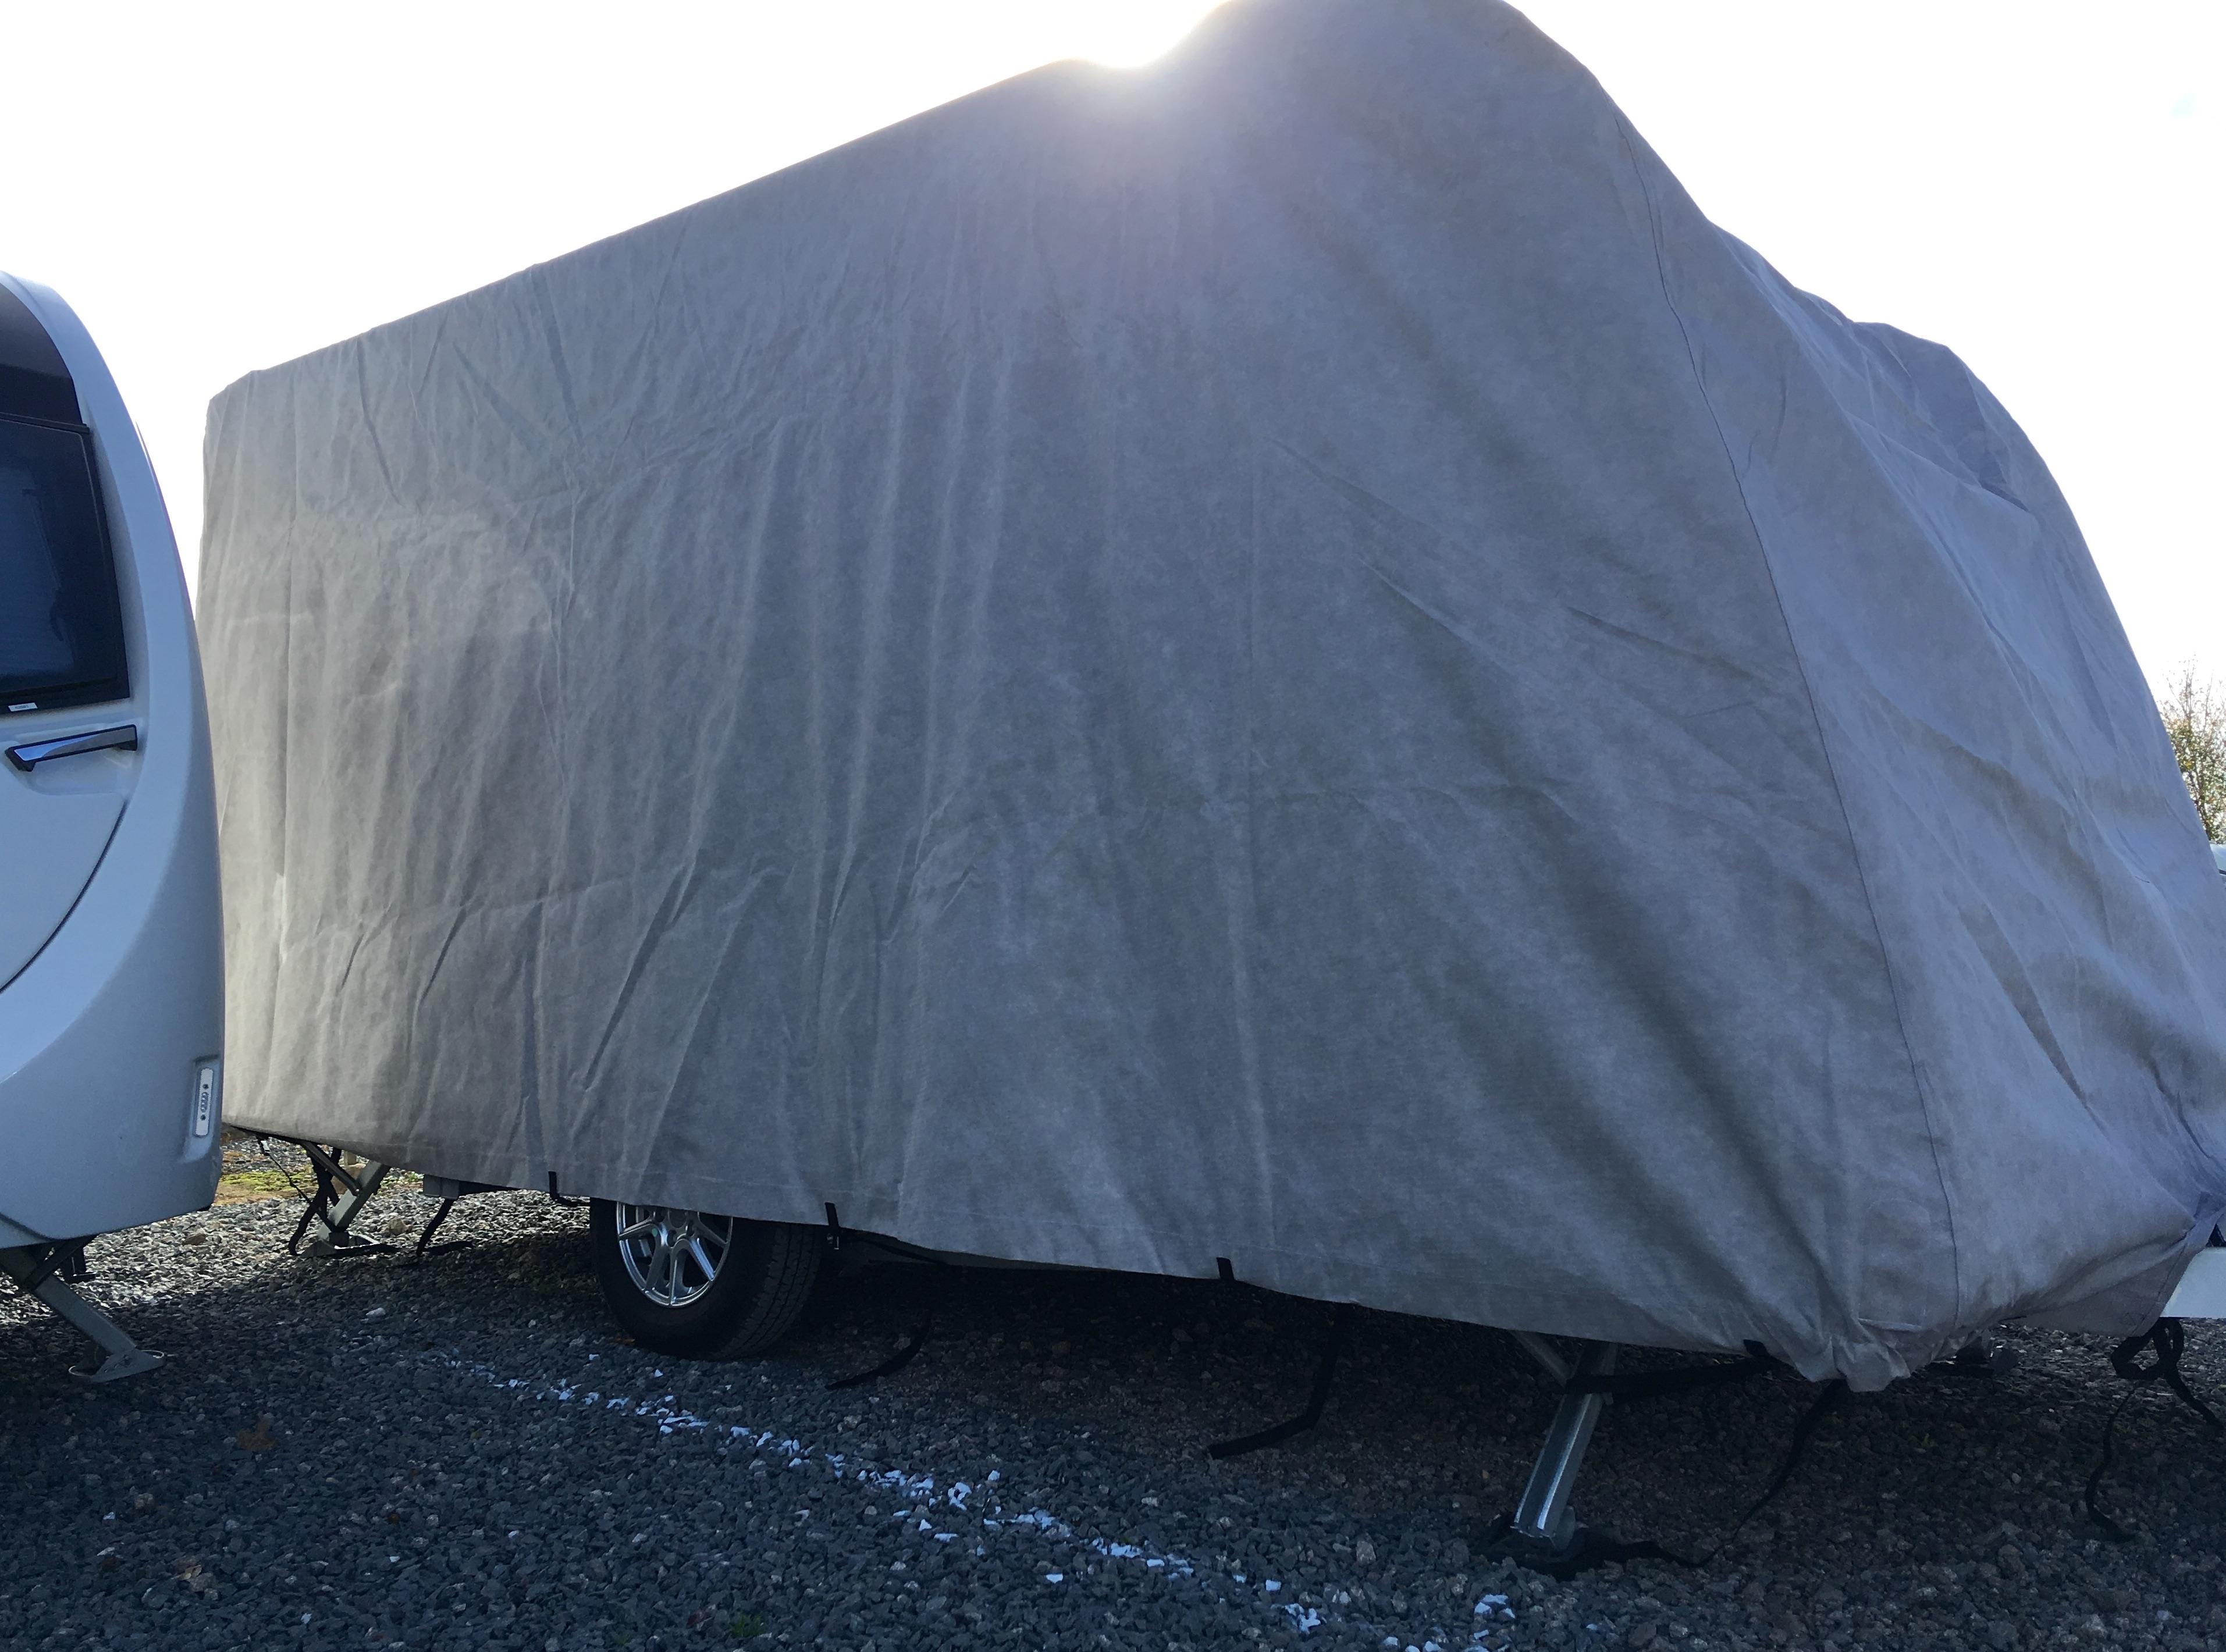 Caravan case study